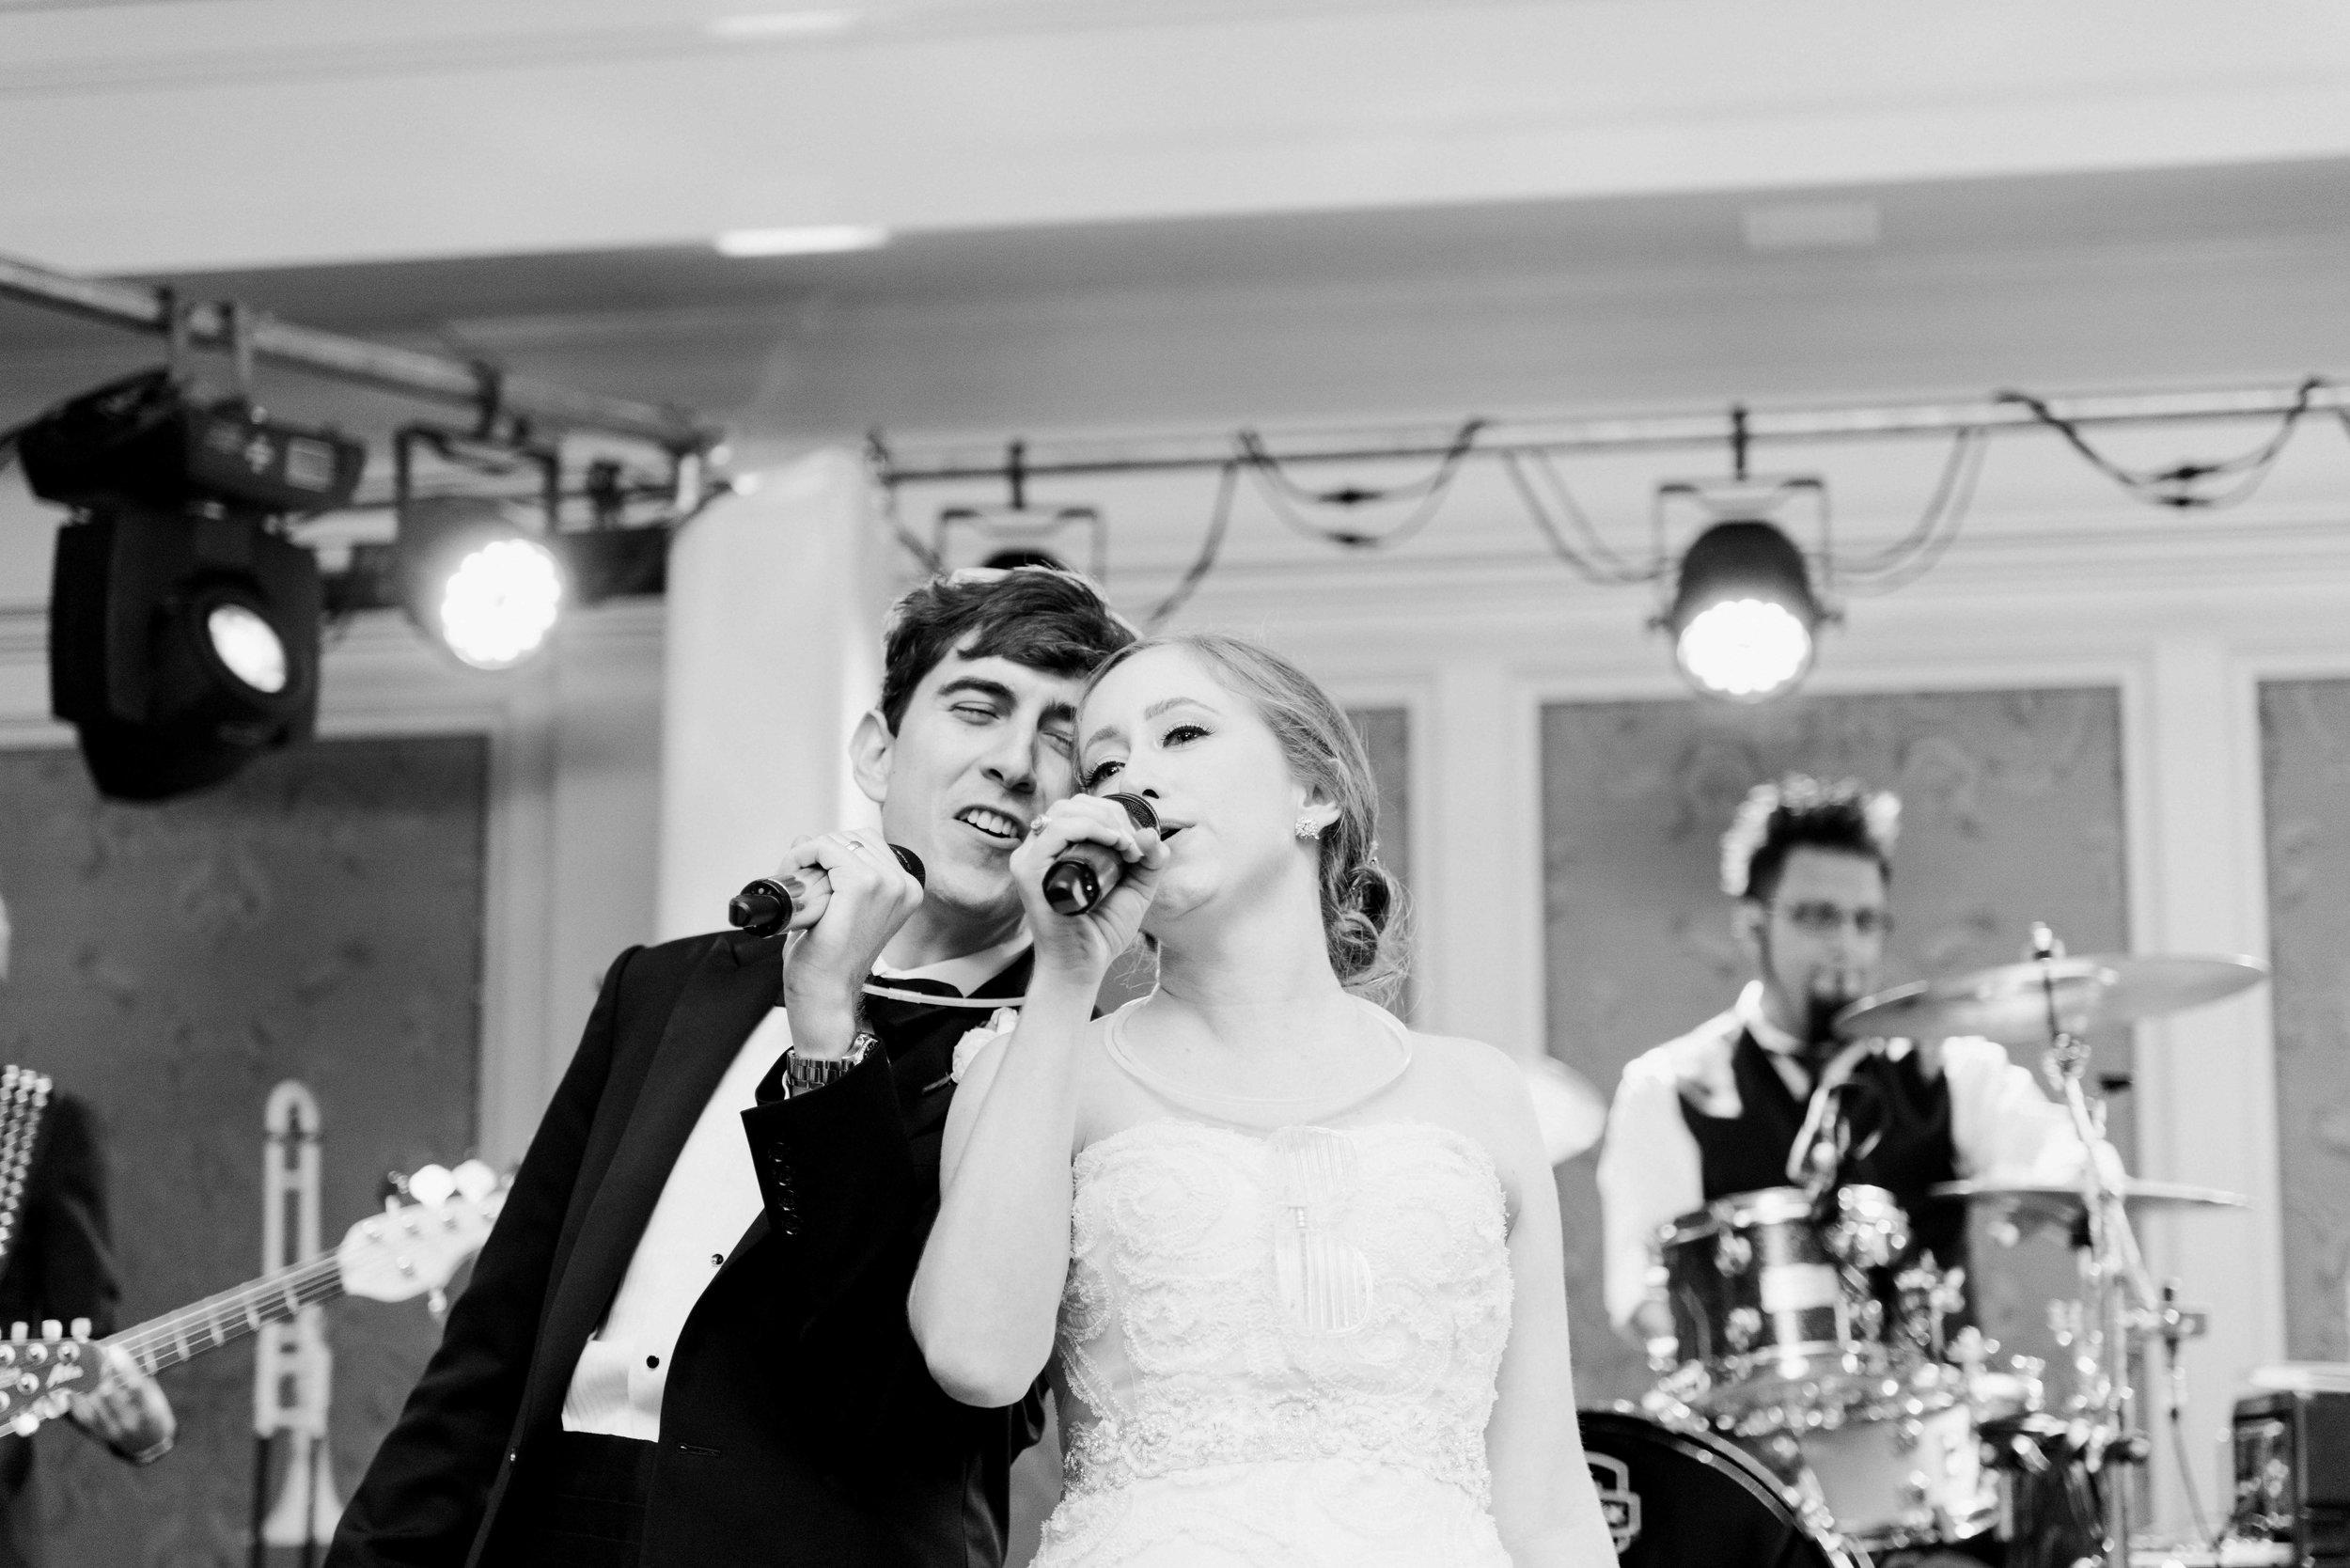 Fine-Art-Film-Houston-Wedding-Photographer-Best-Top-Luxury-Texas-Austin-Dallas-Destination-Dana-Fernandez-Photography-River-Oaks-Country-Club-South-Main-Baptist-Ceremony-Reception-Wedding-42.jpg